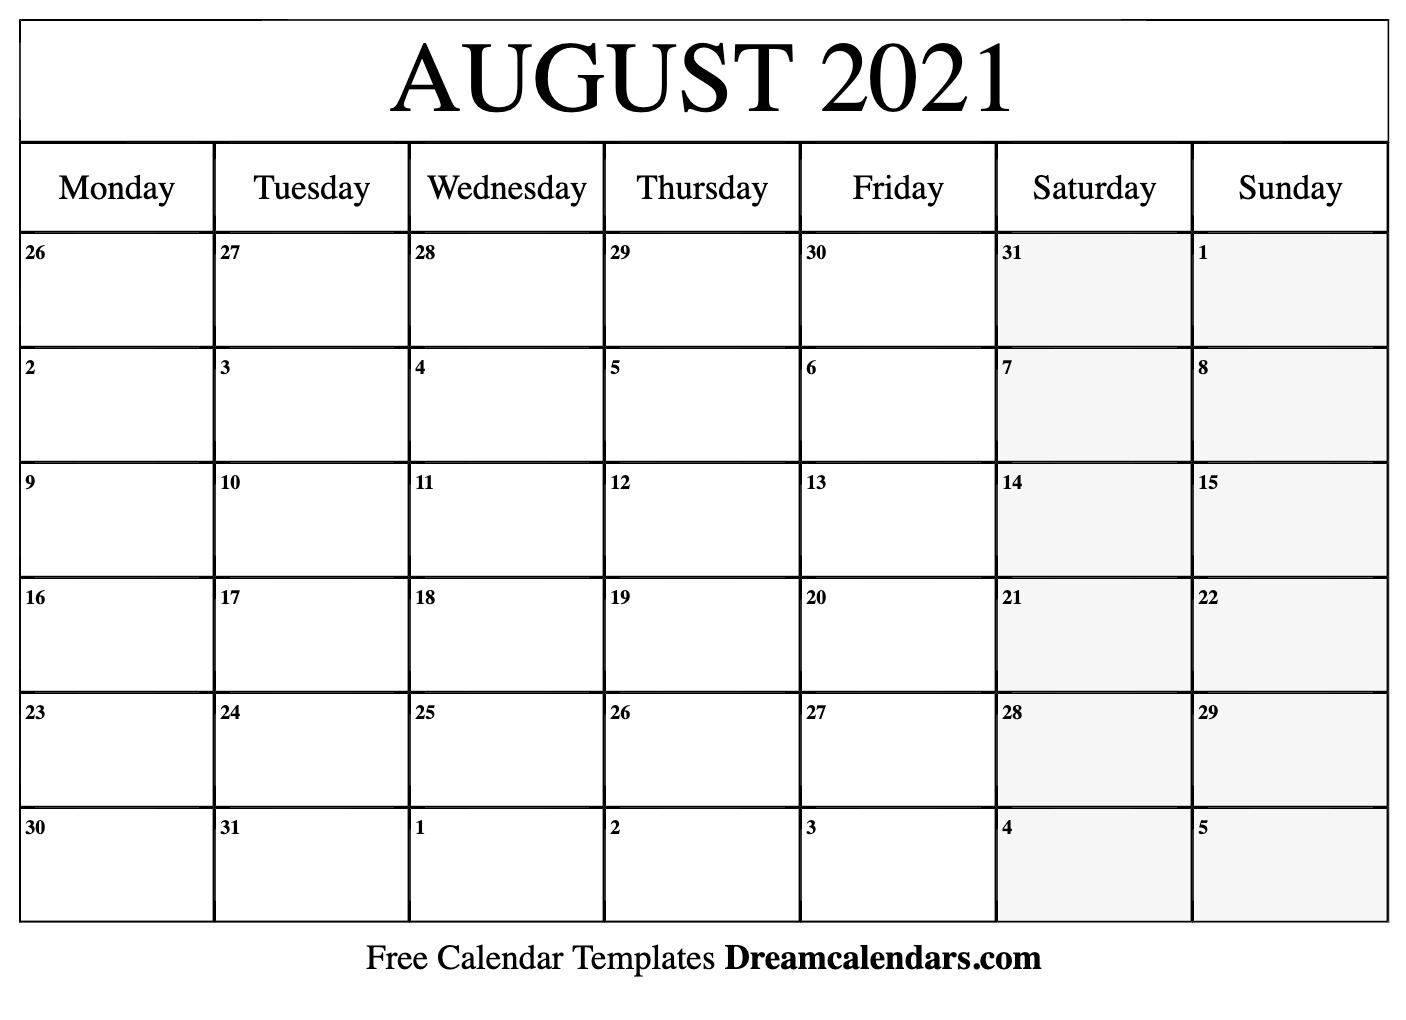 Get Calander Template Monday Sunday August 2021